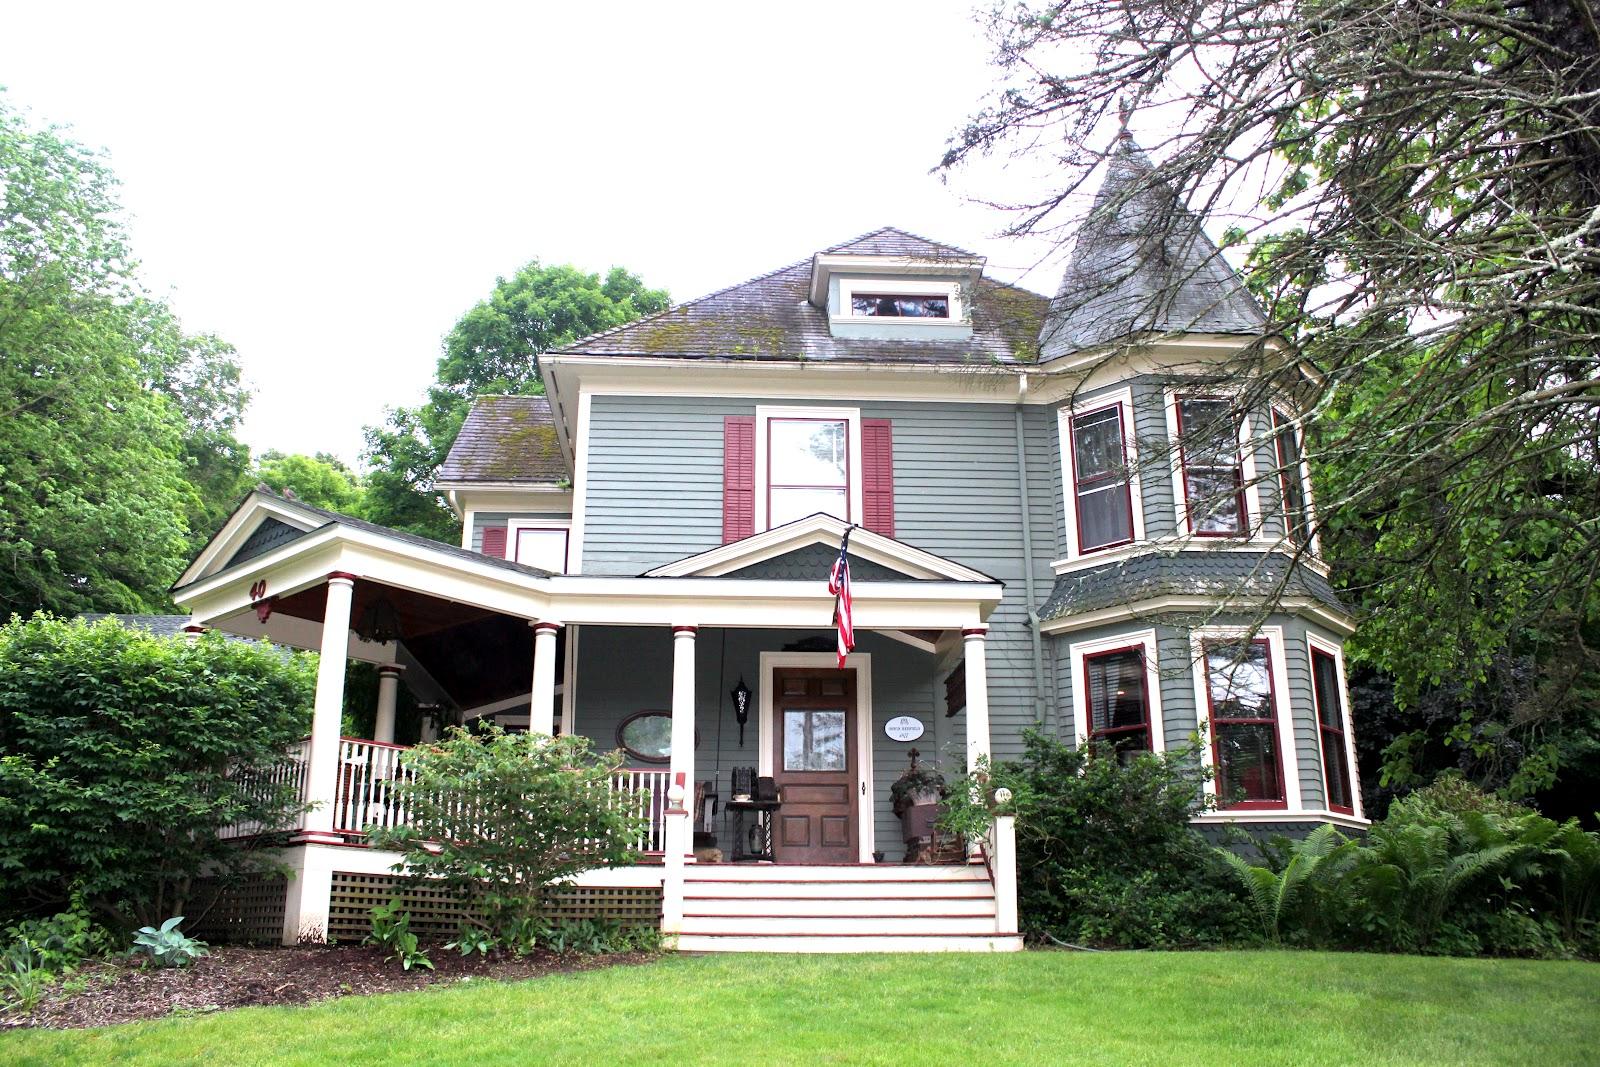 52 Flea Deanna 39 S Beautiful Victorian Home